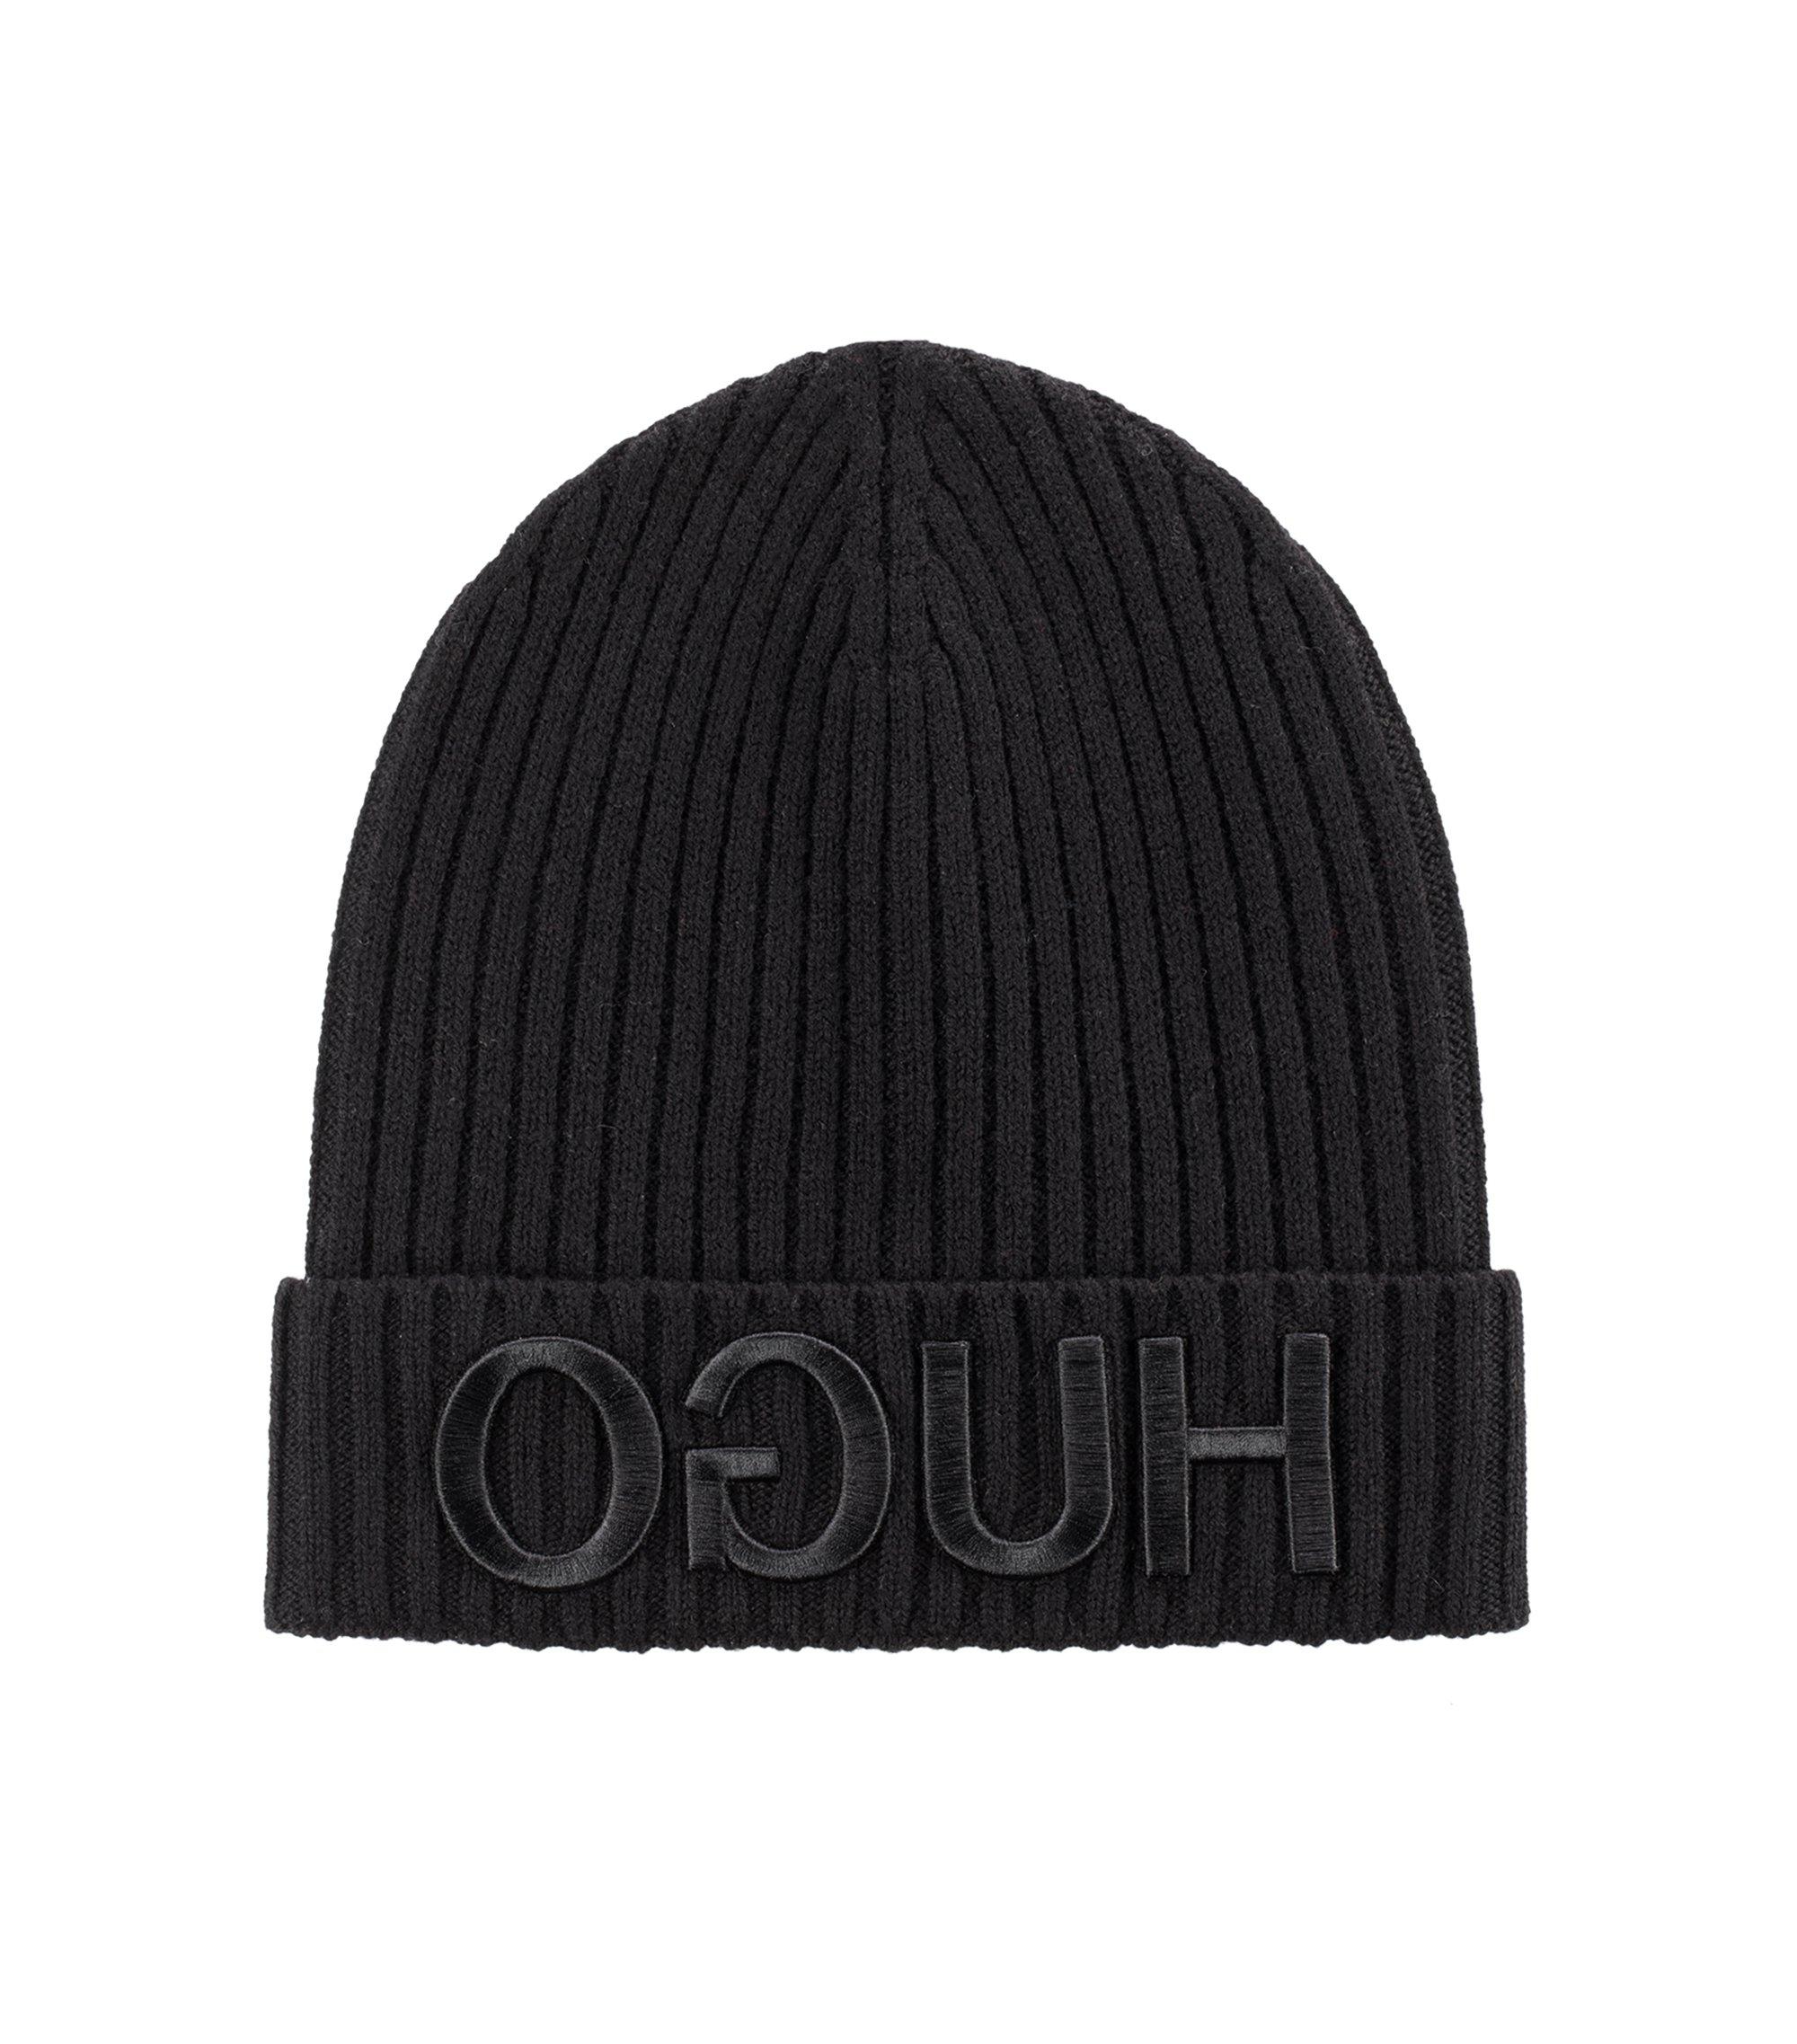 Unisex beanie hat in wool with reverse logo, Black